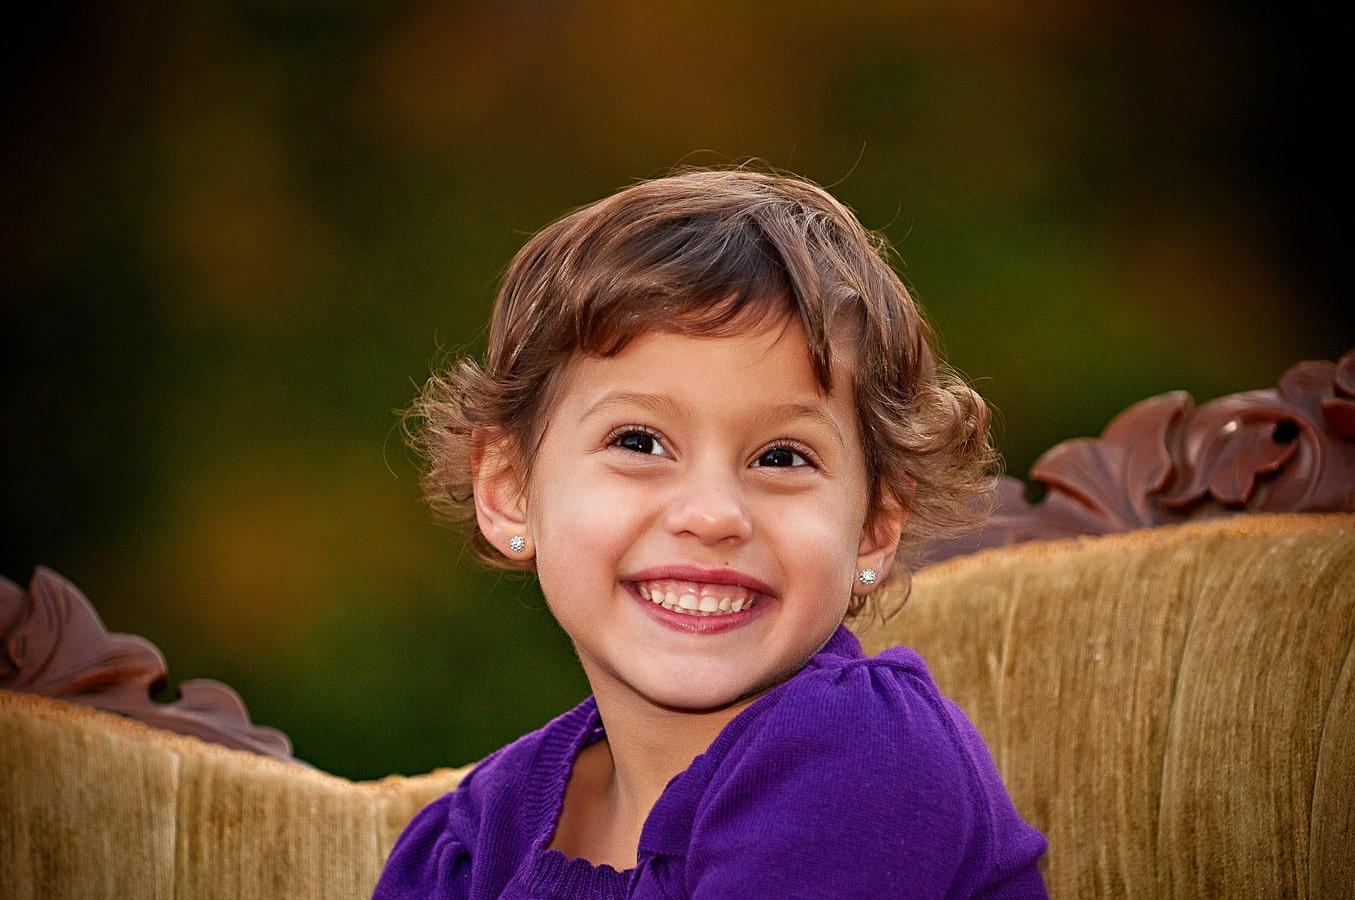 child, portrait, outdoor, sofa, Northern VA